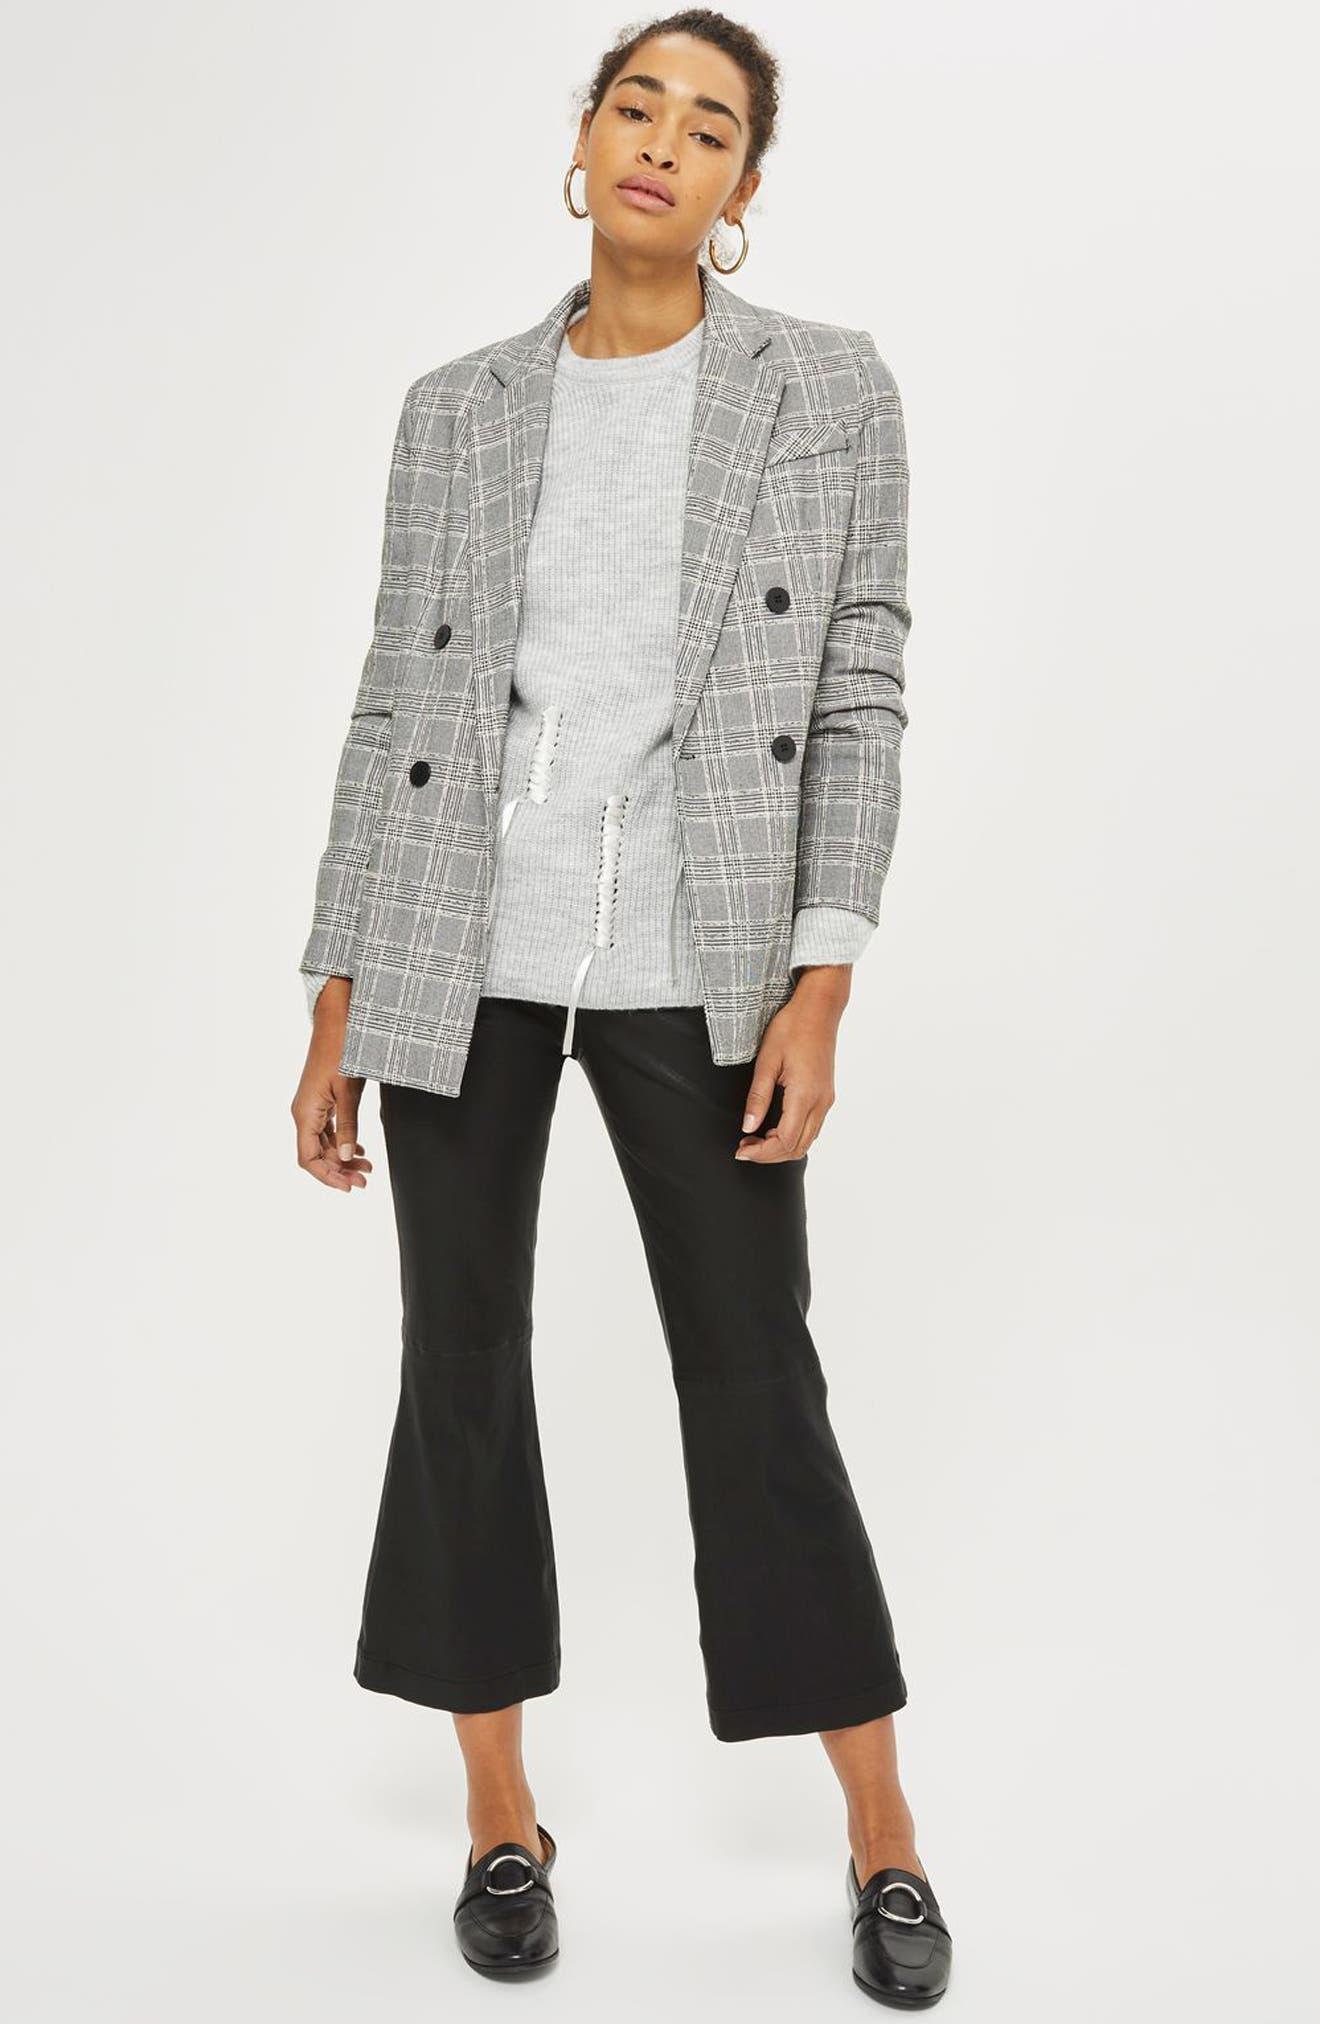 Ribbon Detail Sweater,                             Alternate thumbnail 2, color,                             Grey Marl